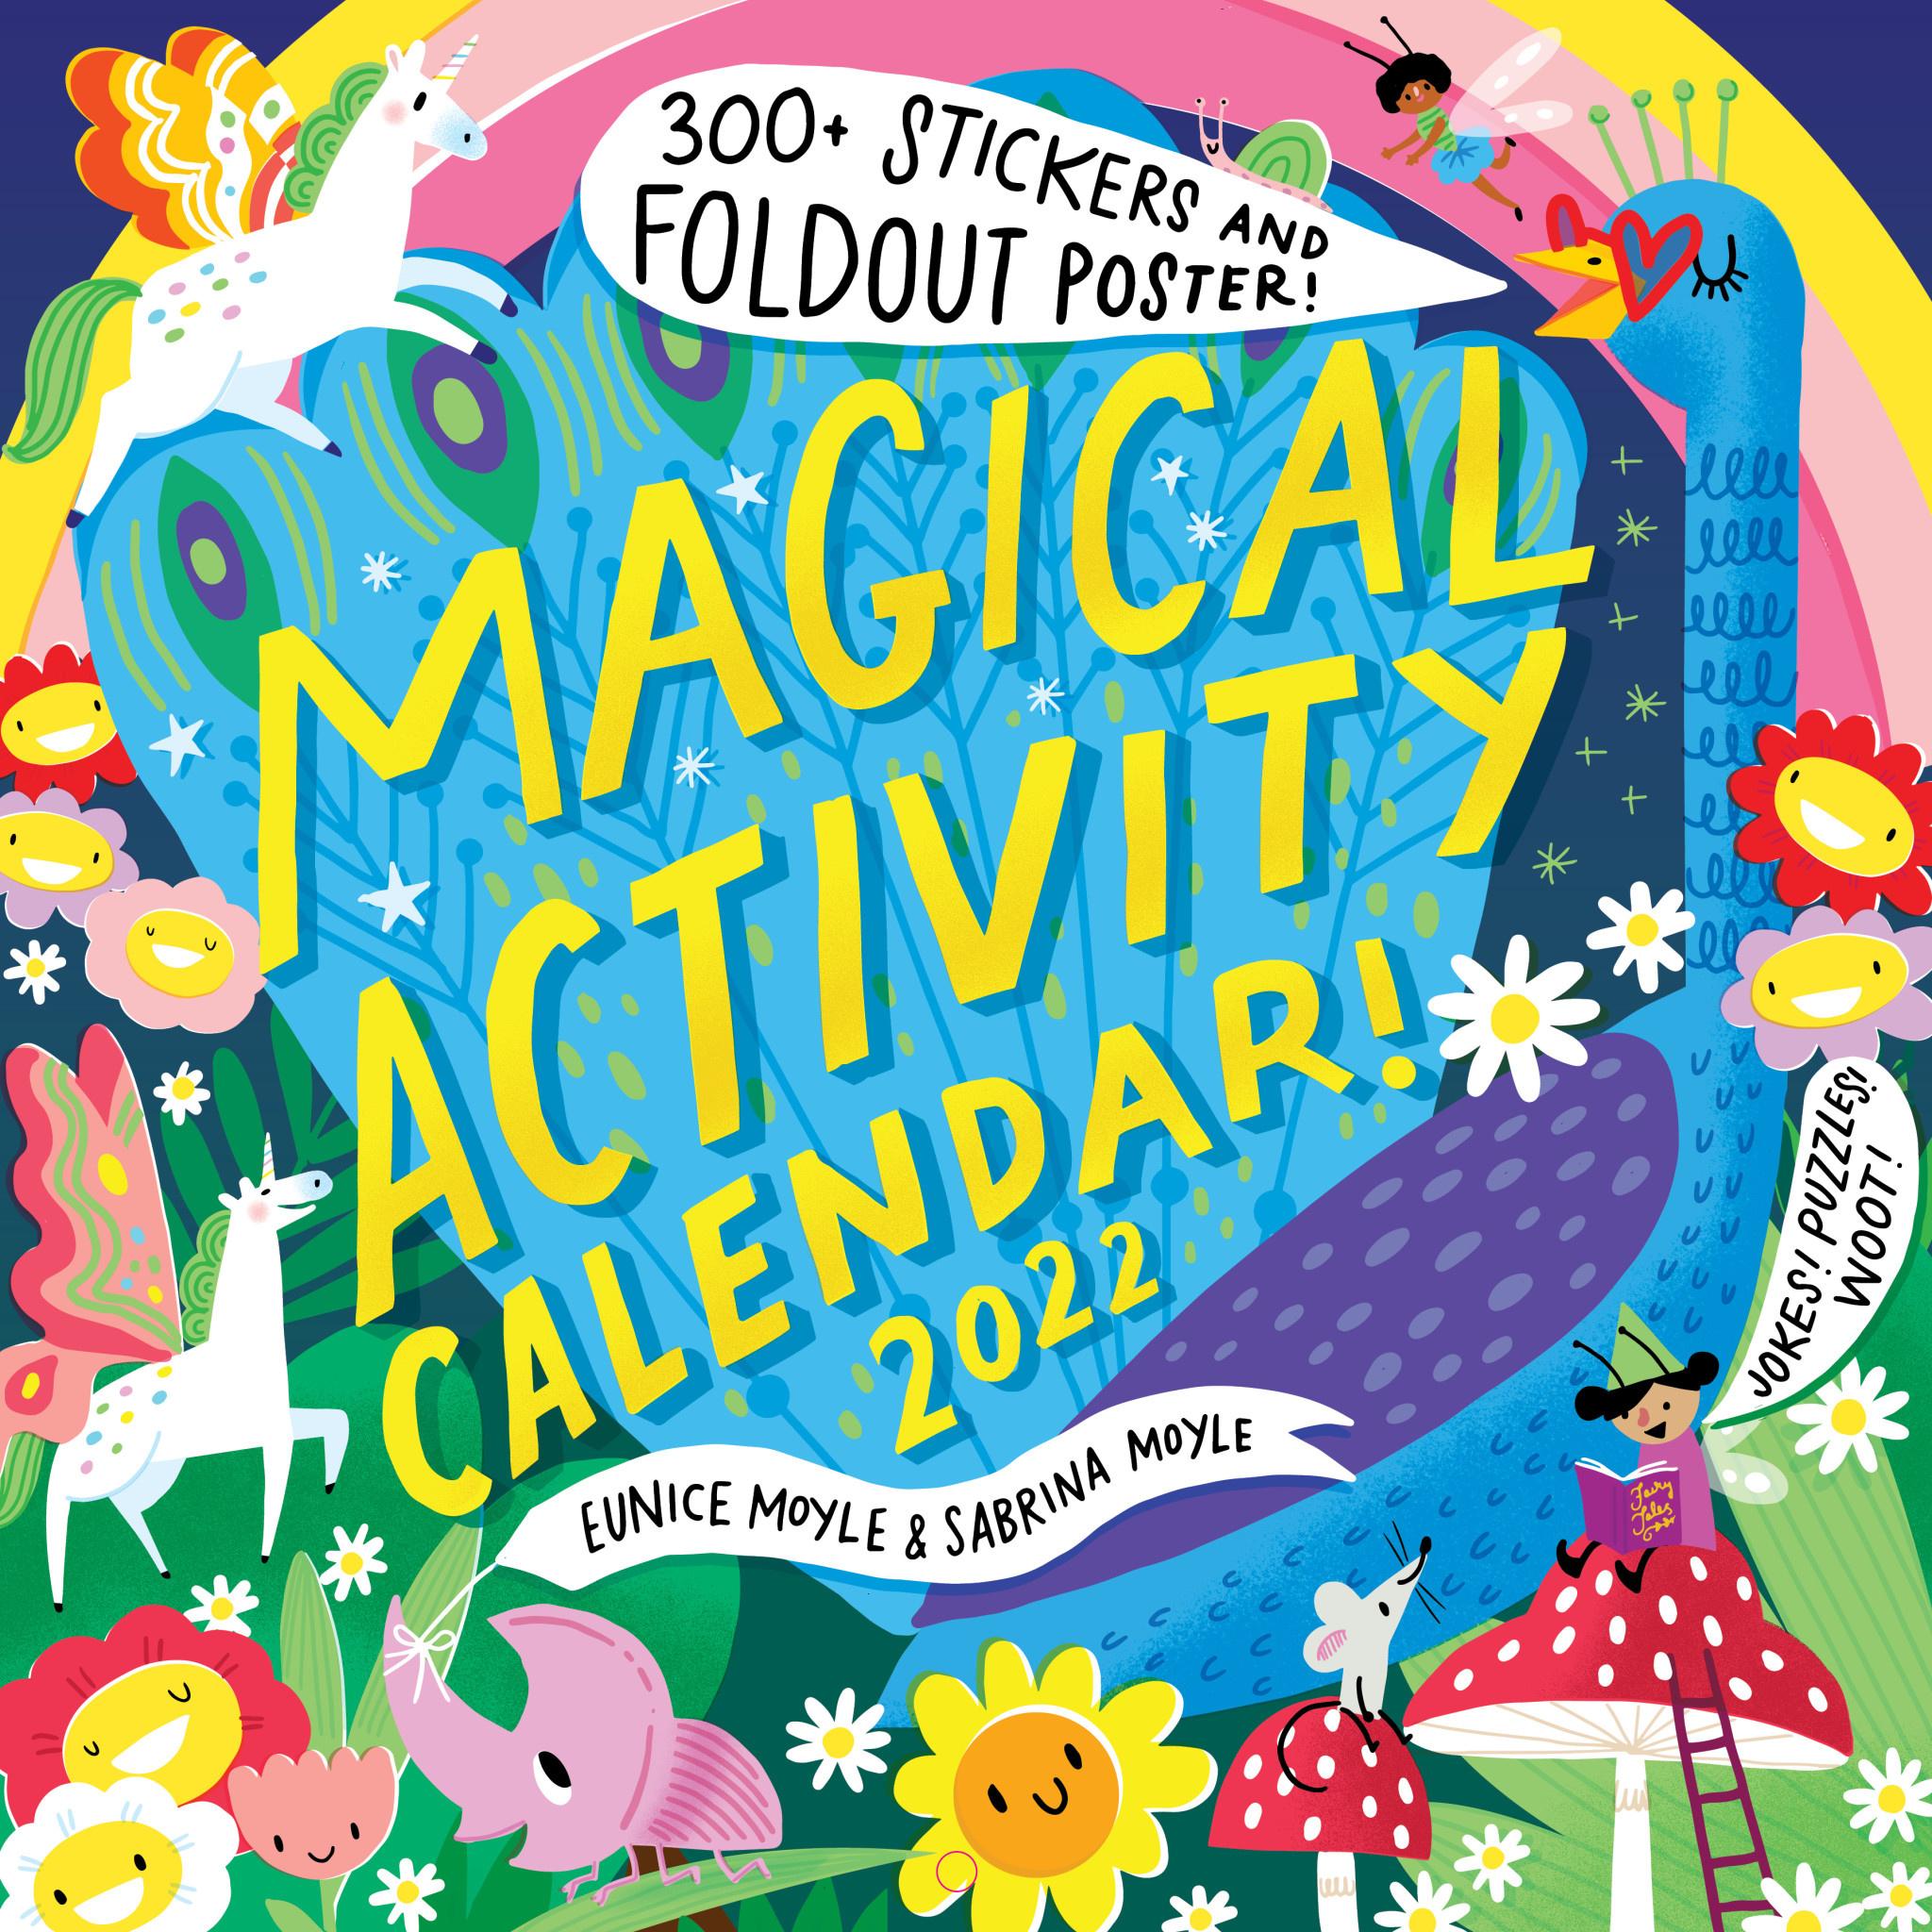 workman publishing Magical Activity Calendar